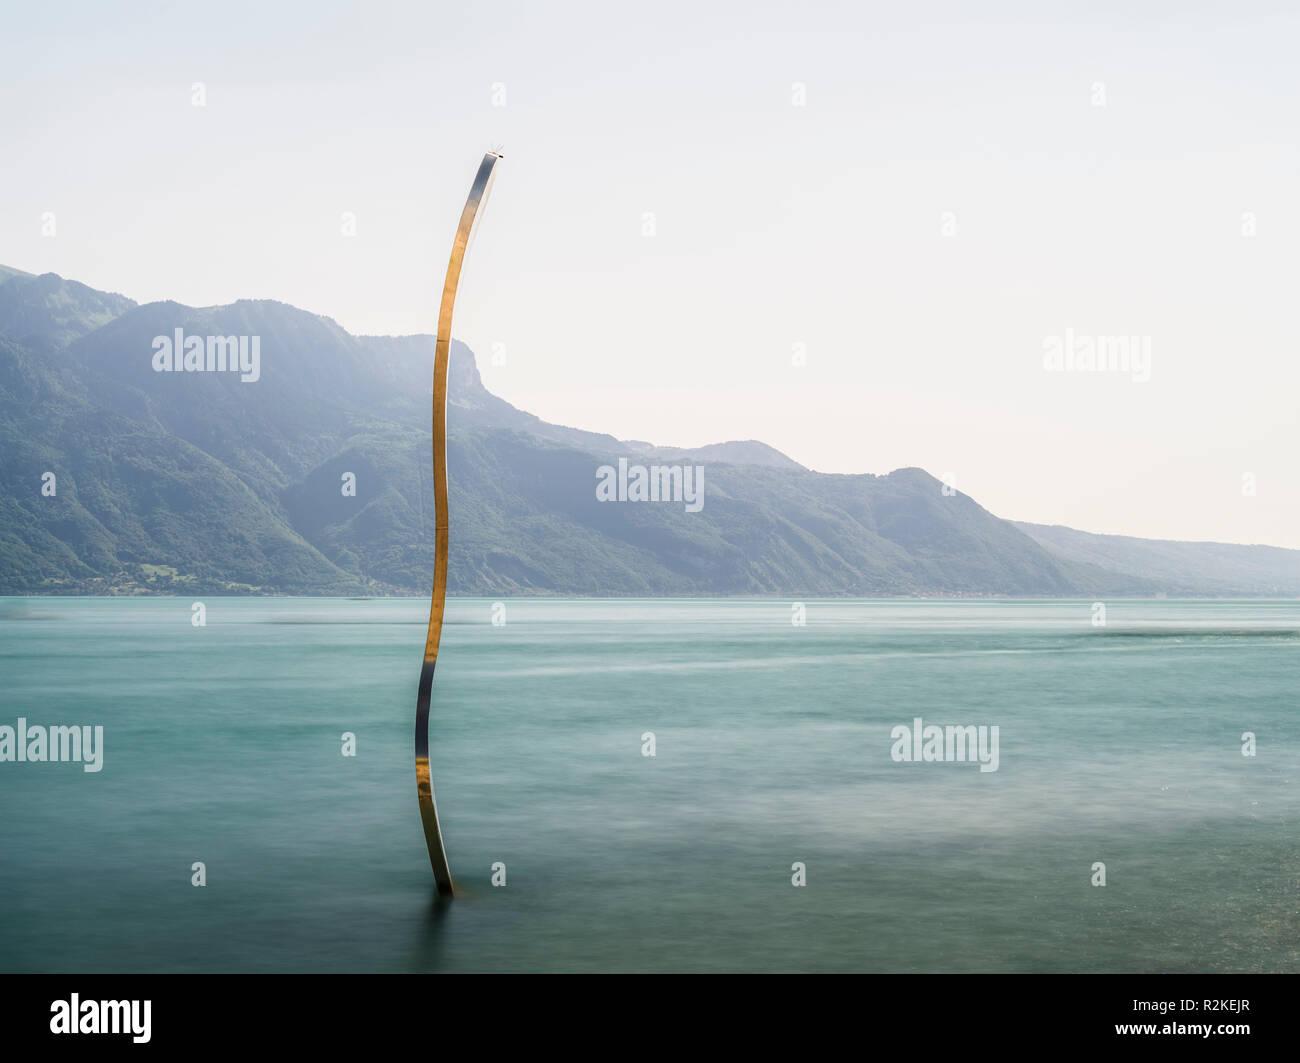 Abstract interpretation of the fork in Lake Geneva at Vevey - Stock Image